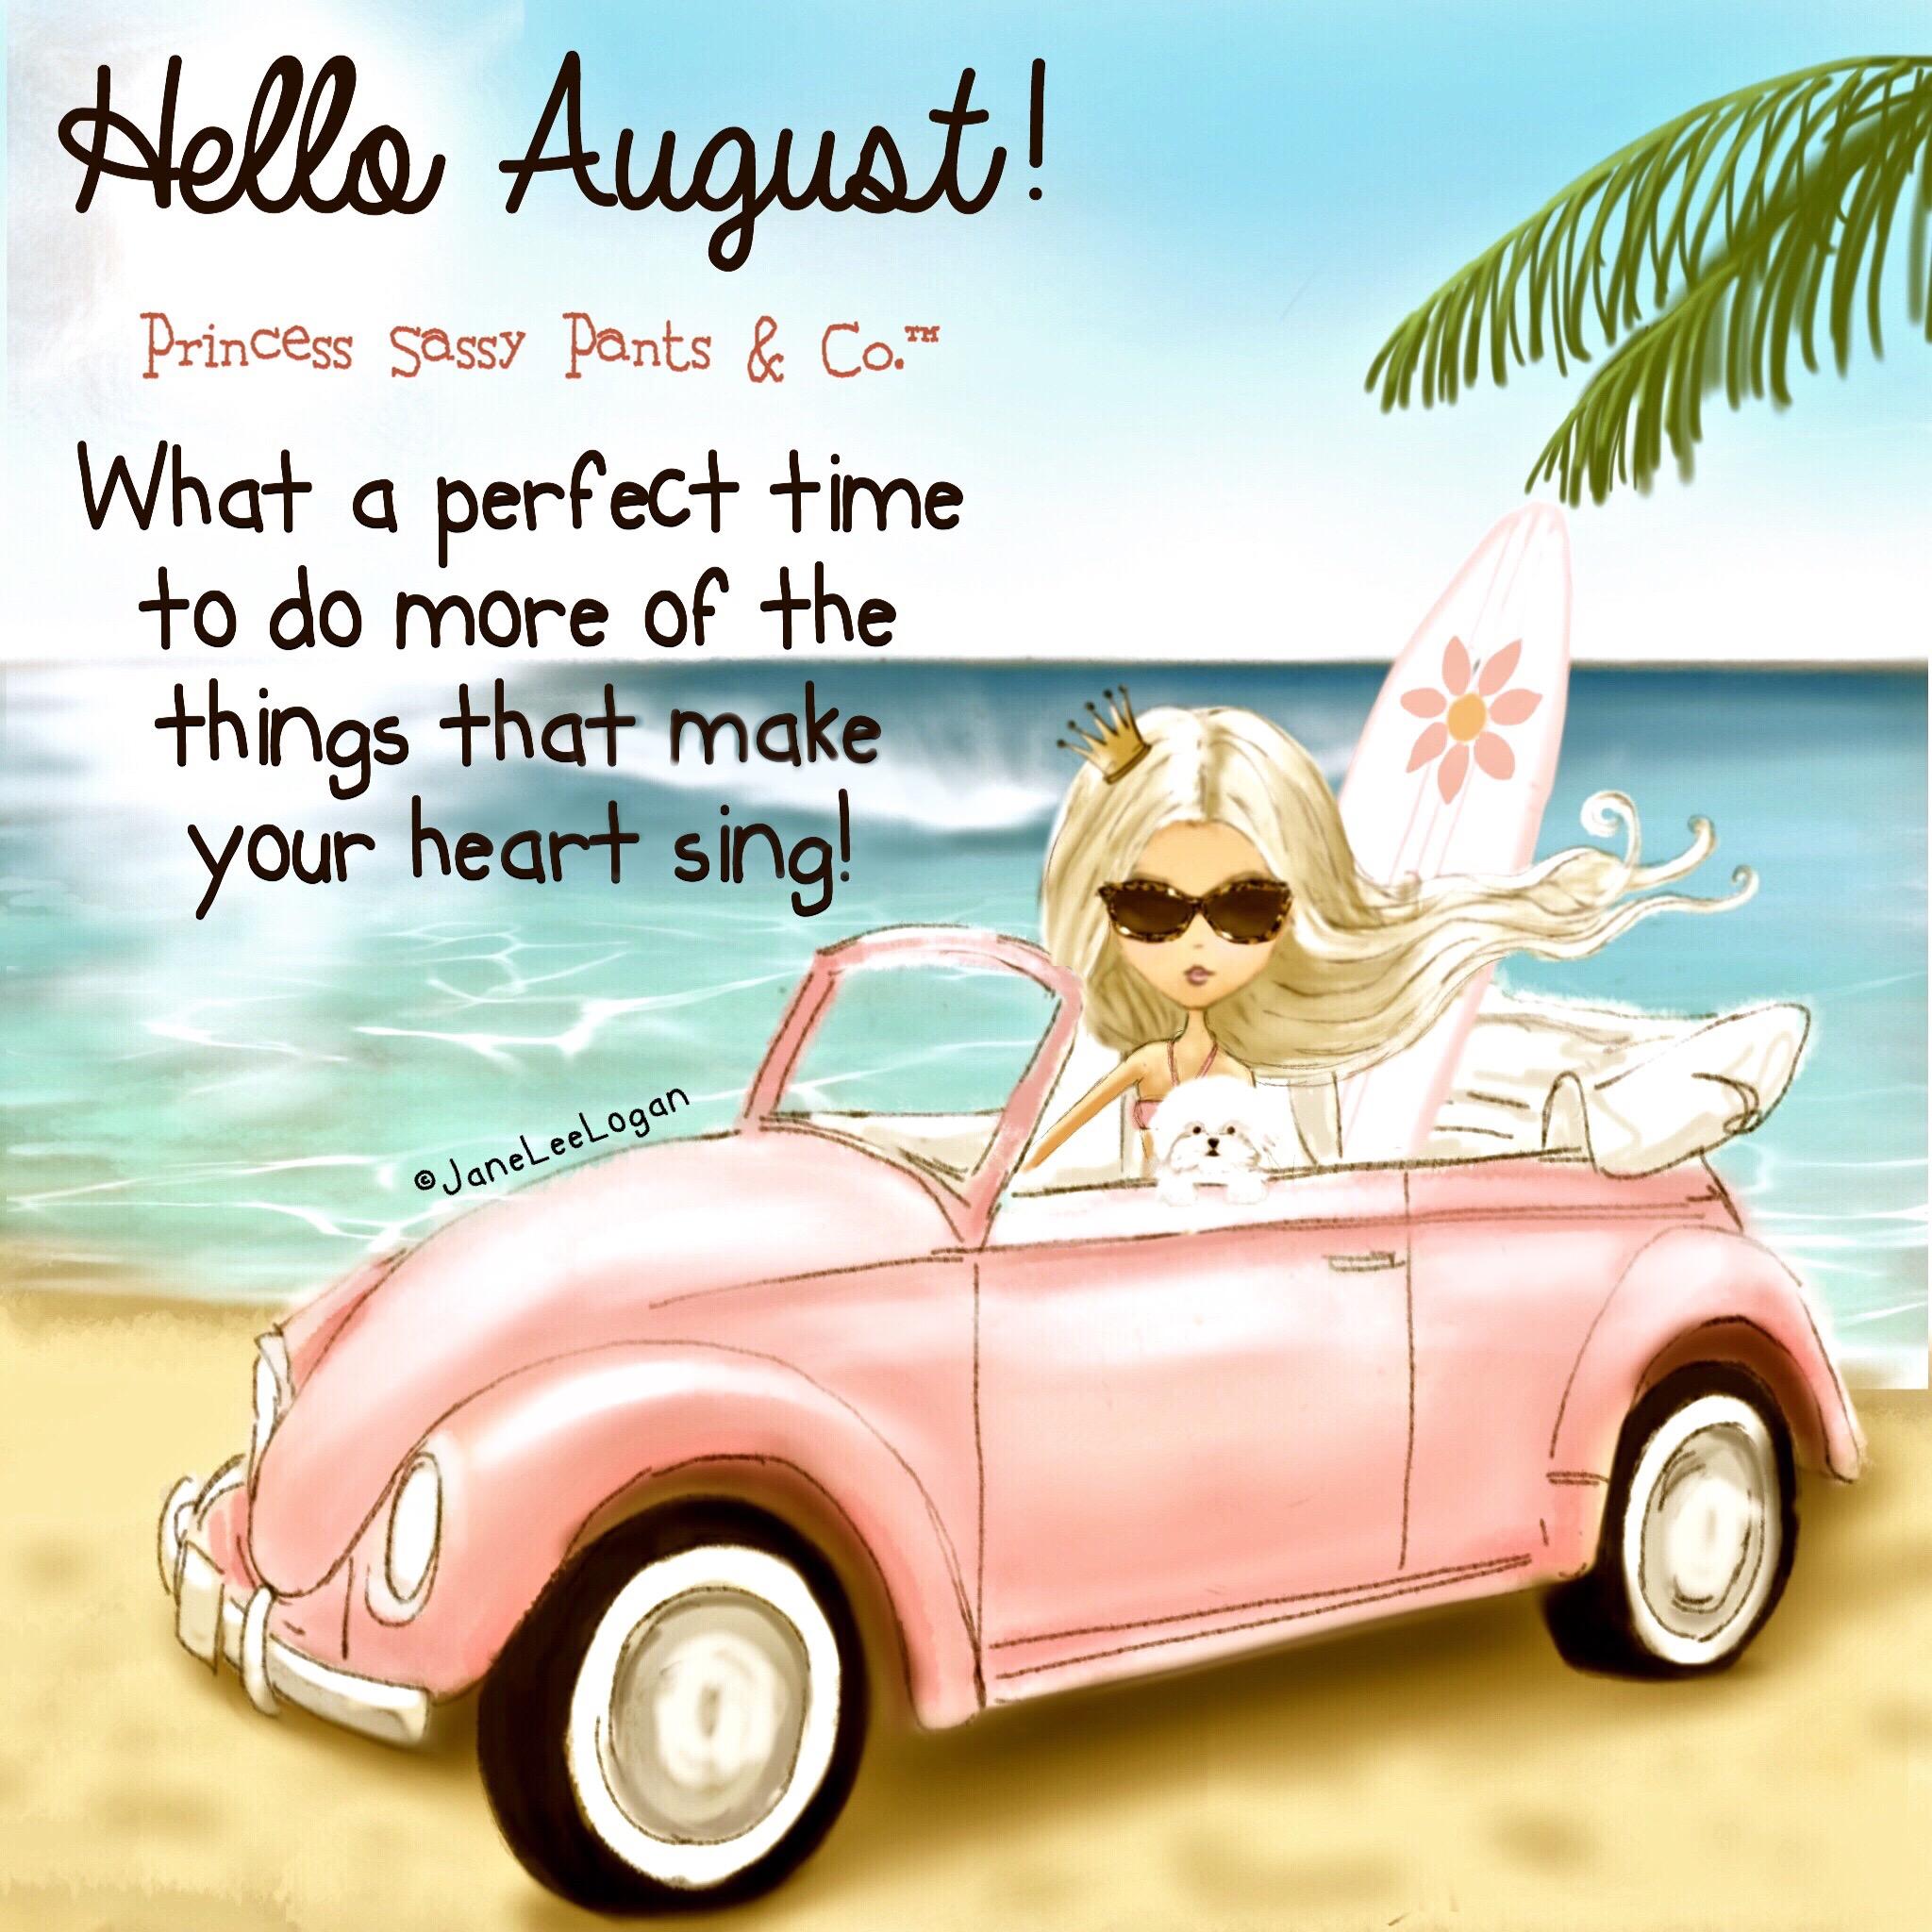 Hello August! | Princess Sassy Pants & Co.™